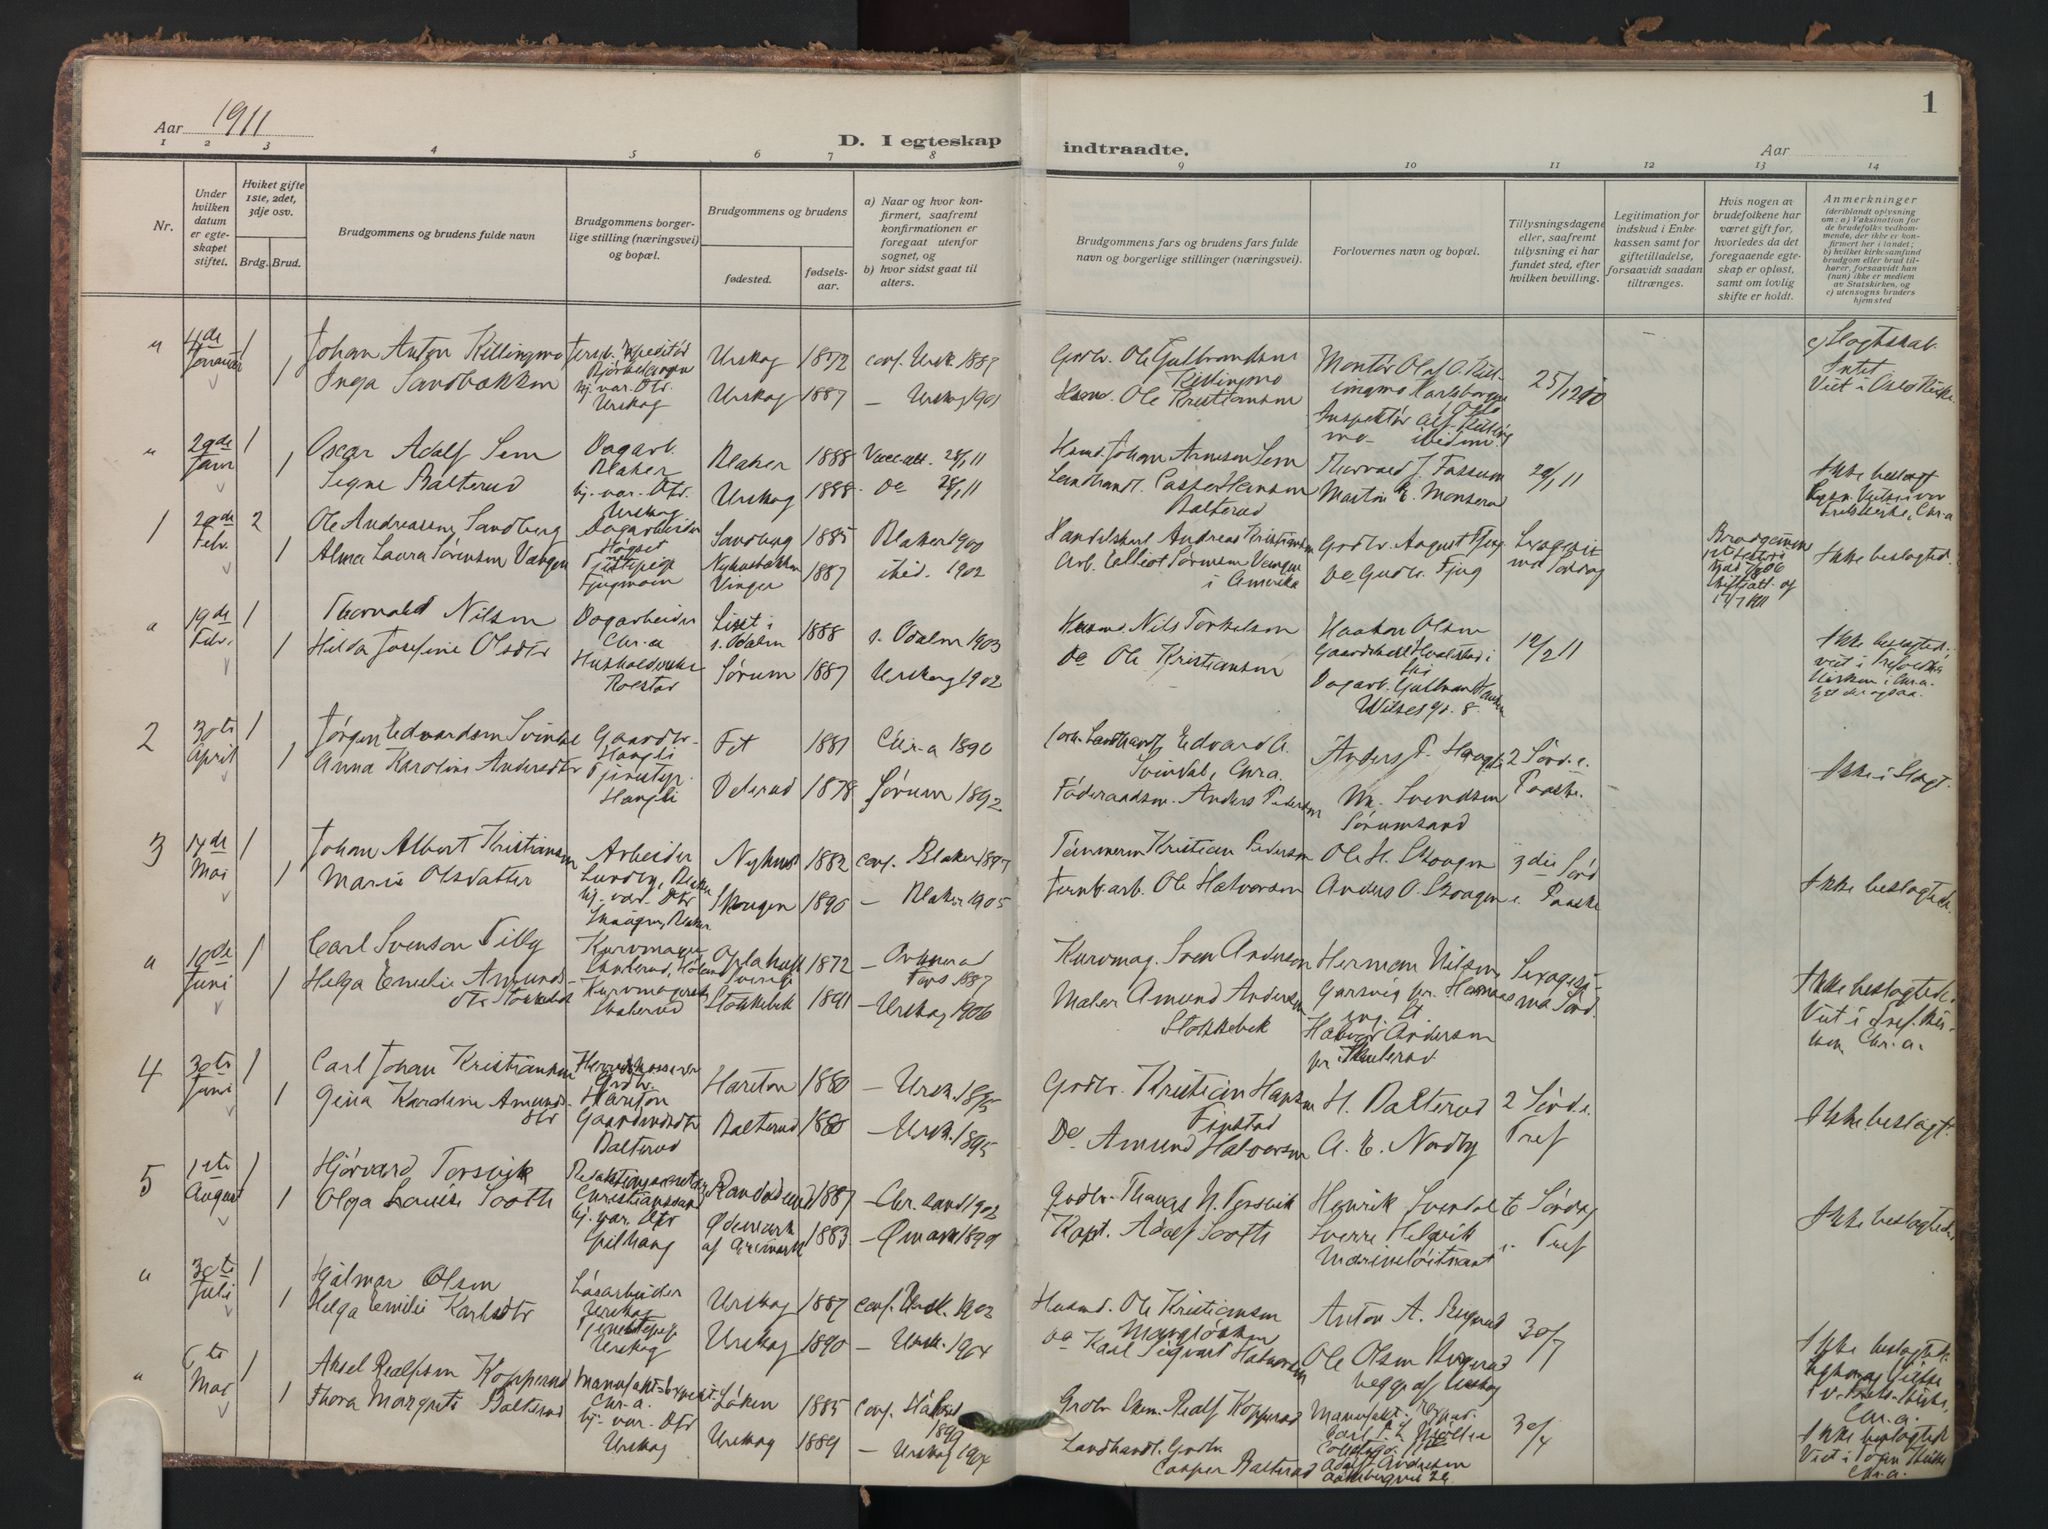 SAO, Aurskog prestekontor Kirkebøker, F/Fa/L0016: Parish register (official) no. I 16, 1910-1934, p. 1